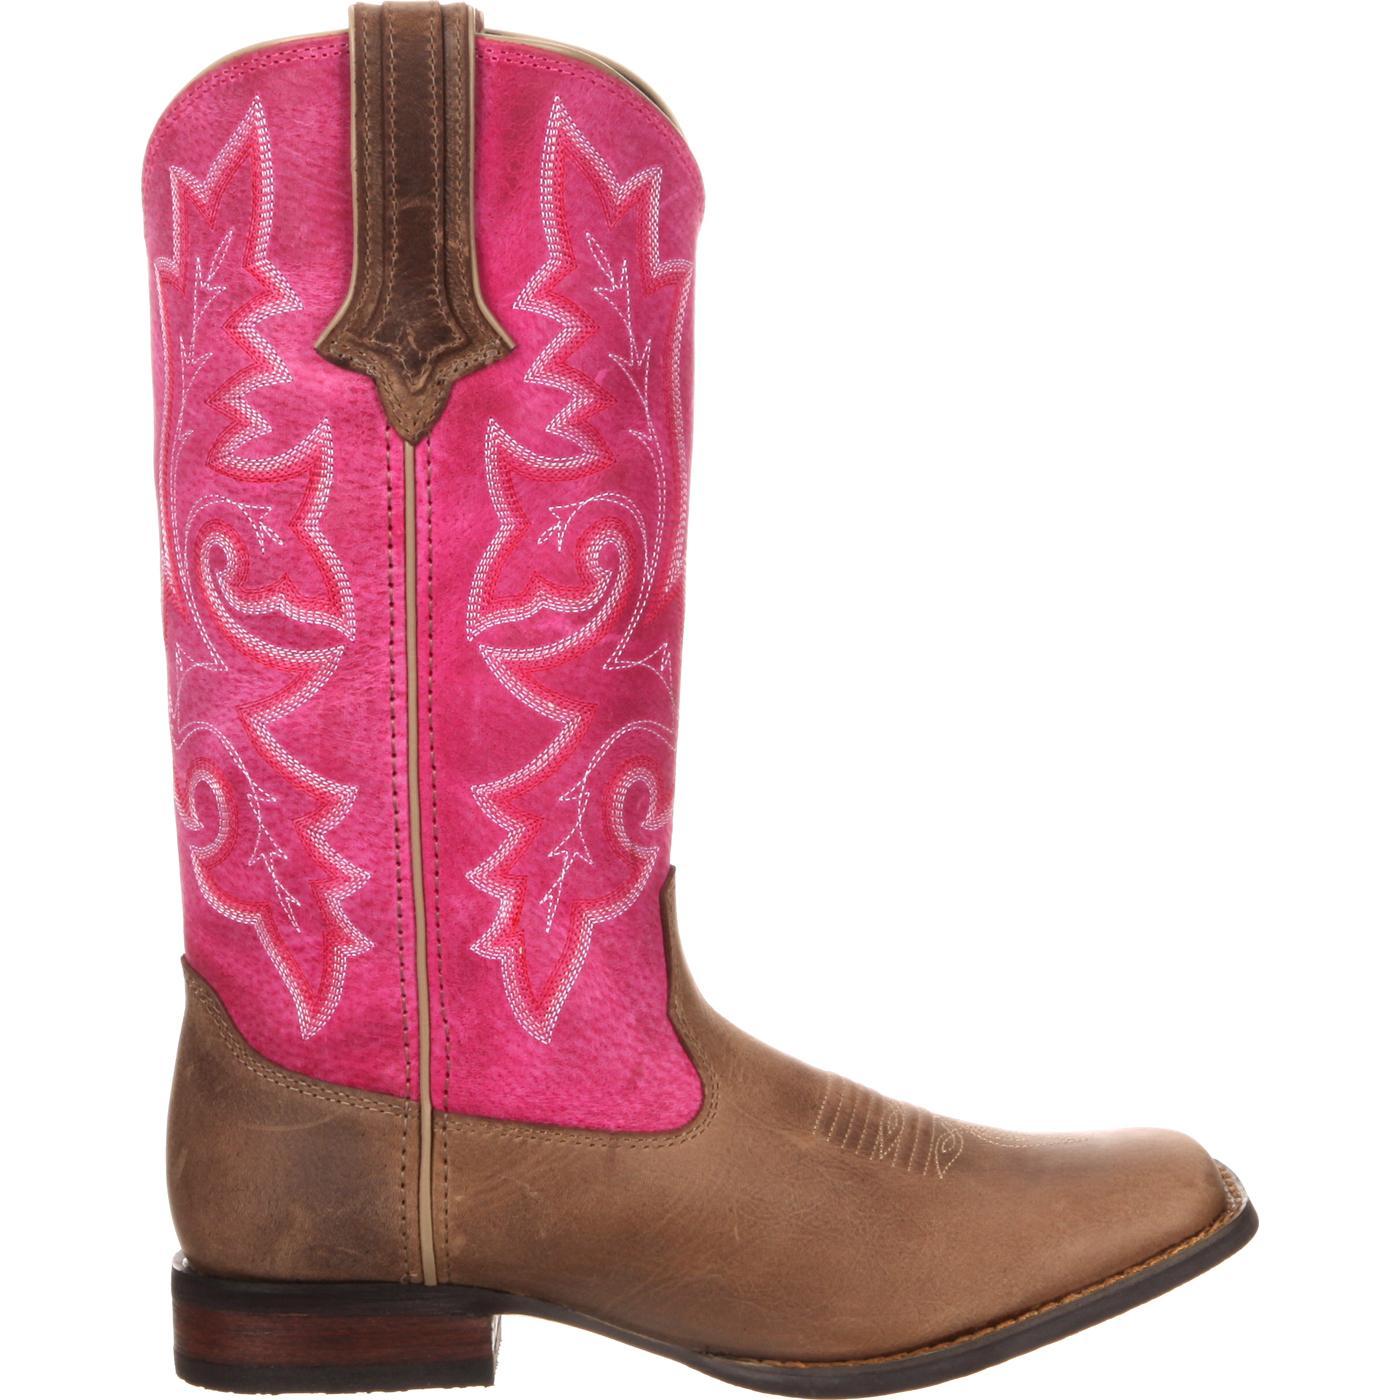 3e78341fe Images. Crush by Durango Women's Western Boot ...